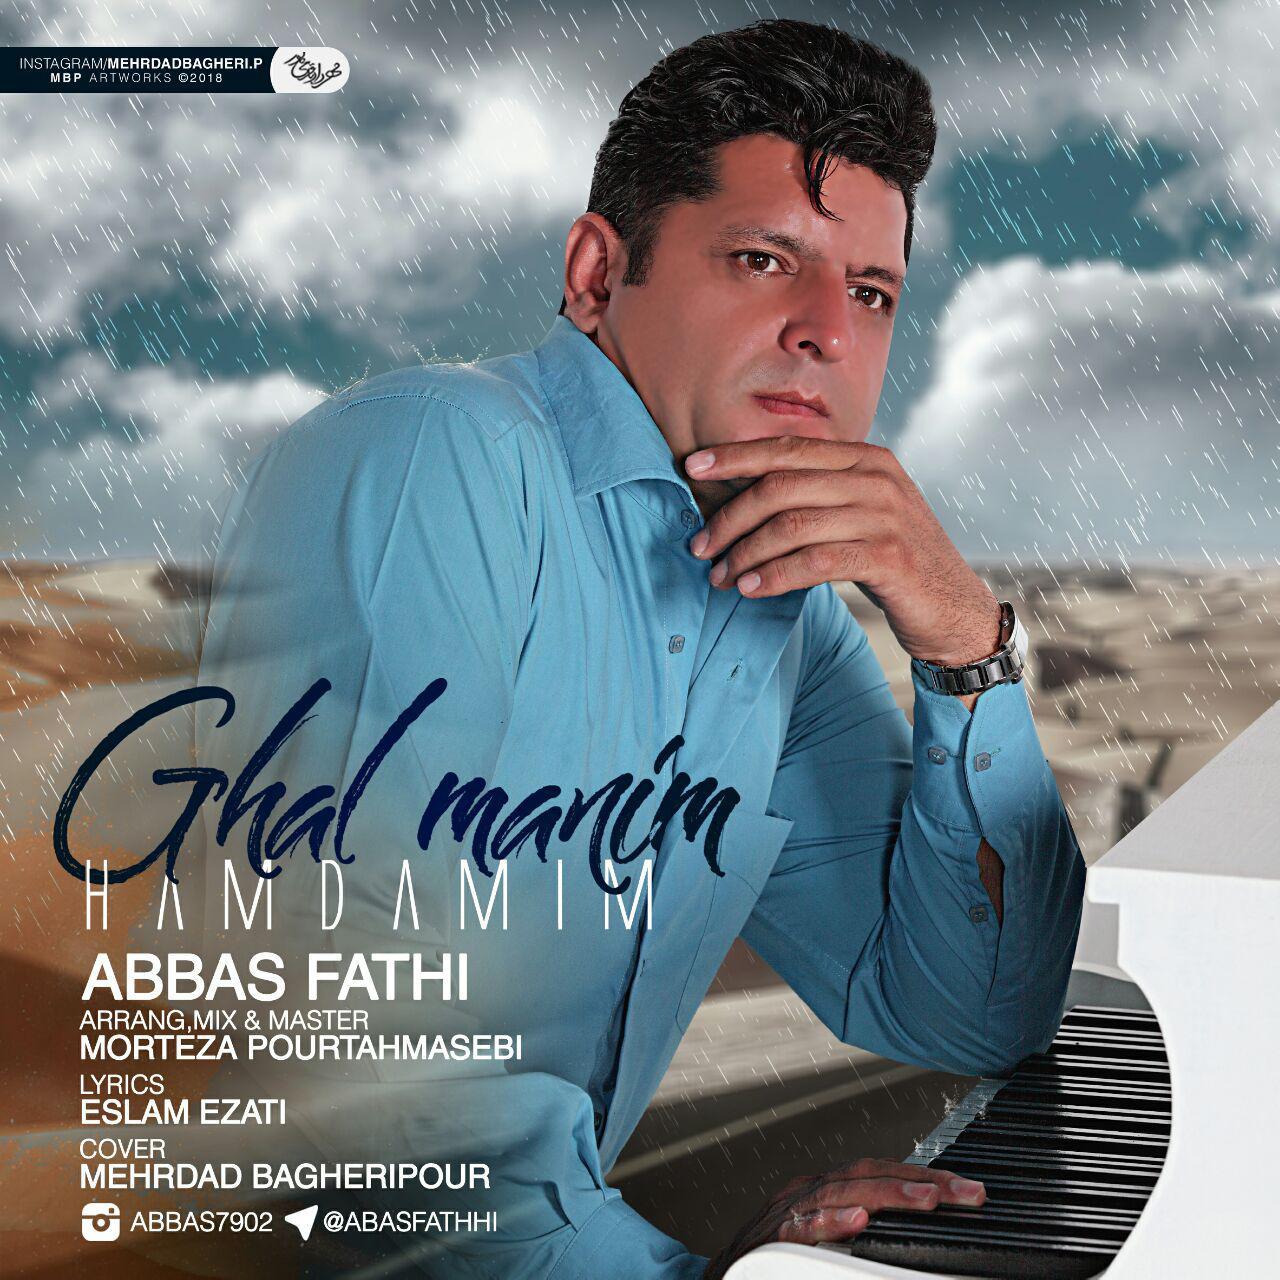 http://birtunes.ir/wp-content/uploads/2018/12/Abbas-Fathi-Gal-Manim-Hamdamim.jpg